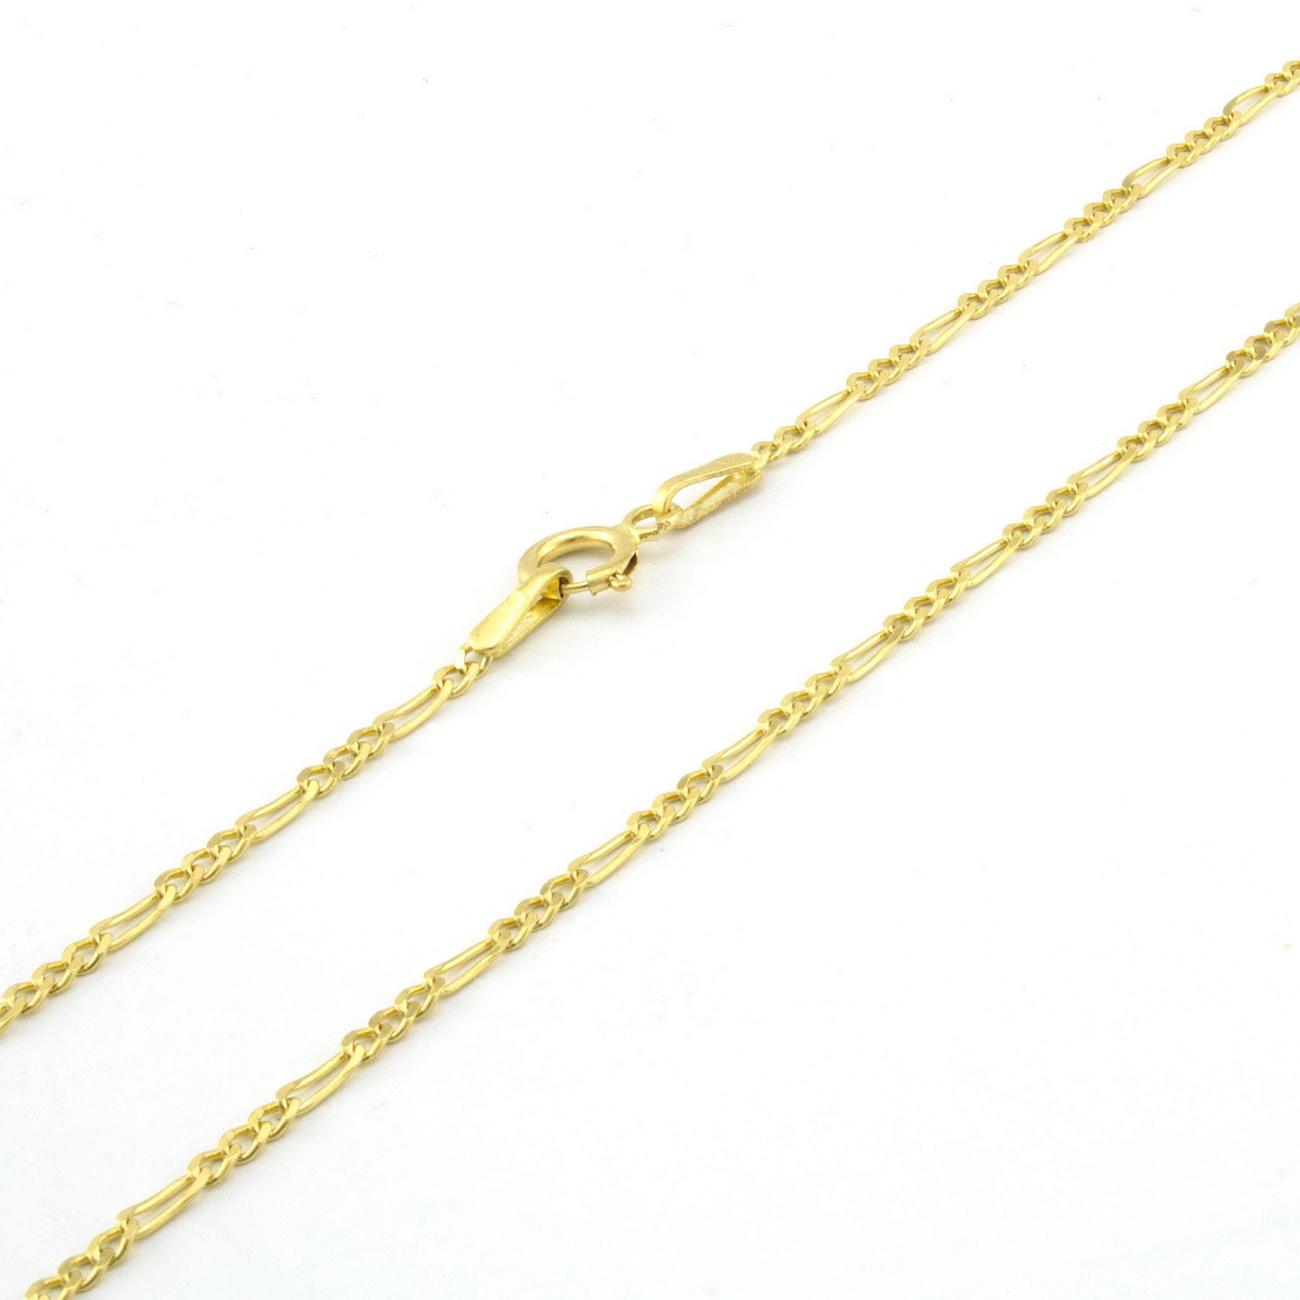 10K-Yellow-Gold-2-5mm-Womens-Dainty-Figaro-Chain-Link-Bracelet-Anklet-7-034-8-034-9-034 thumbnail 20